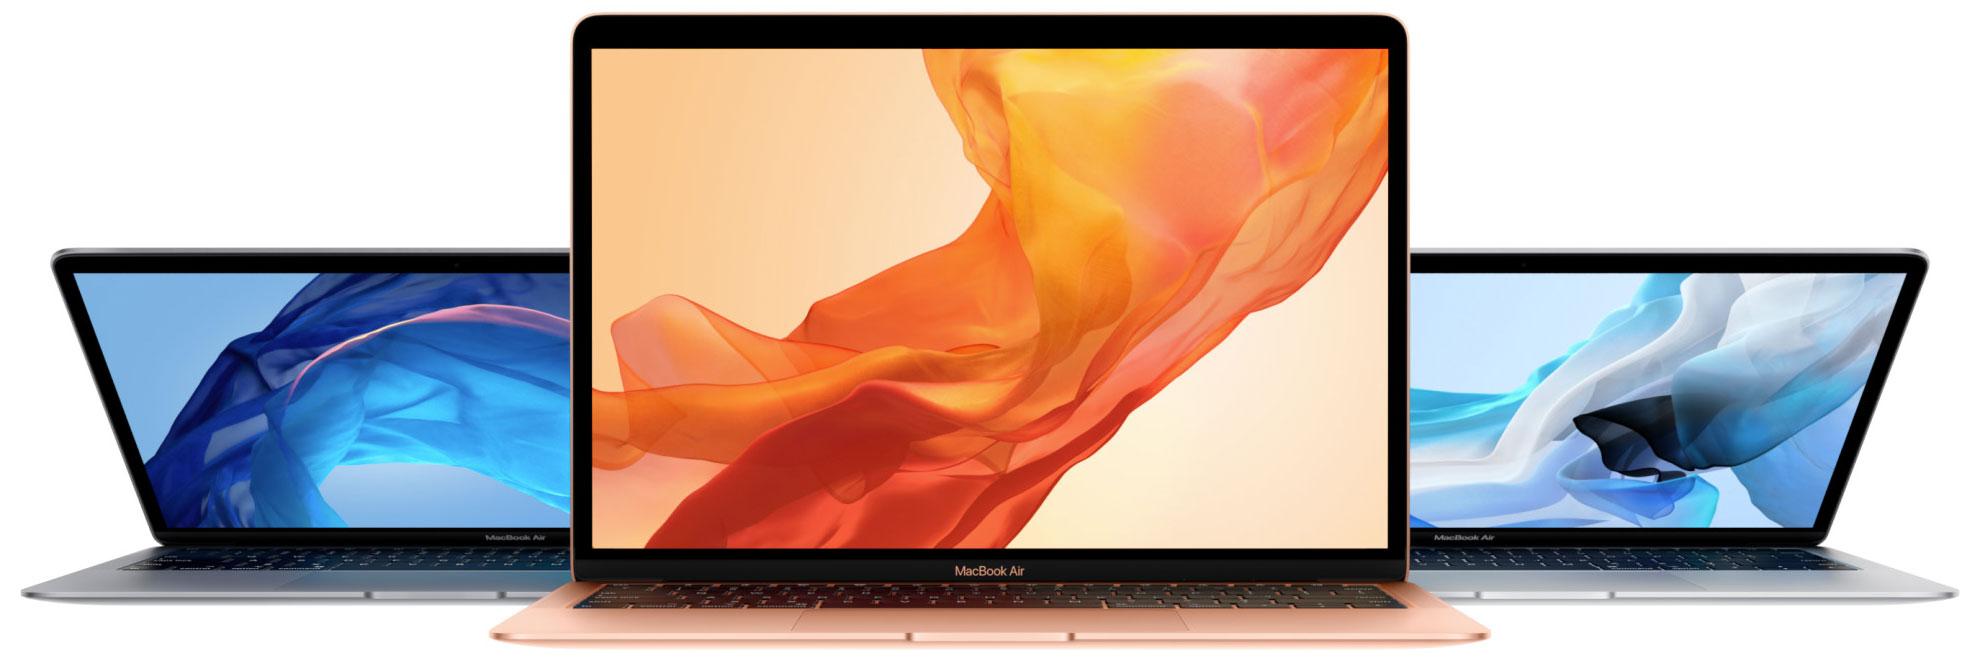 MacBook Air con pantalla Retina